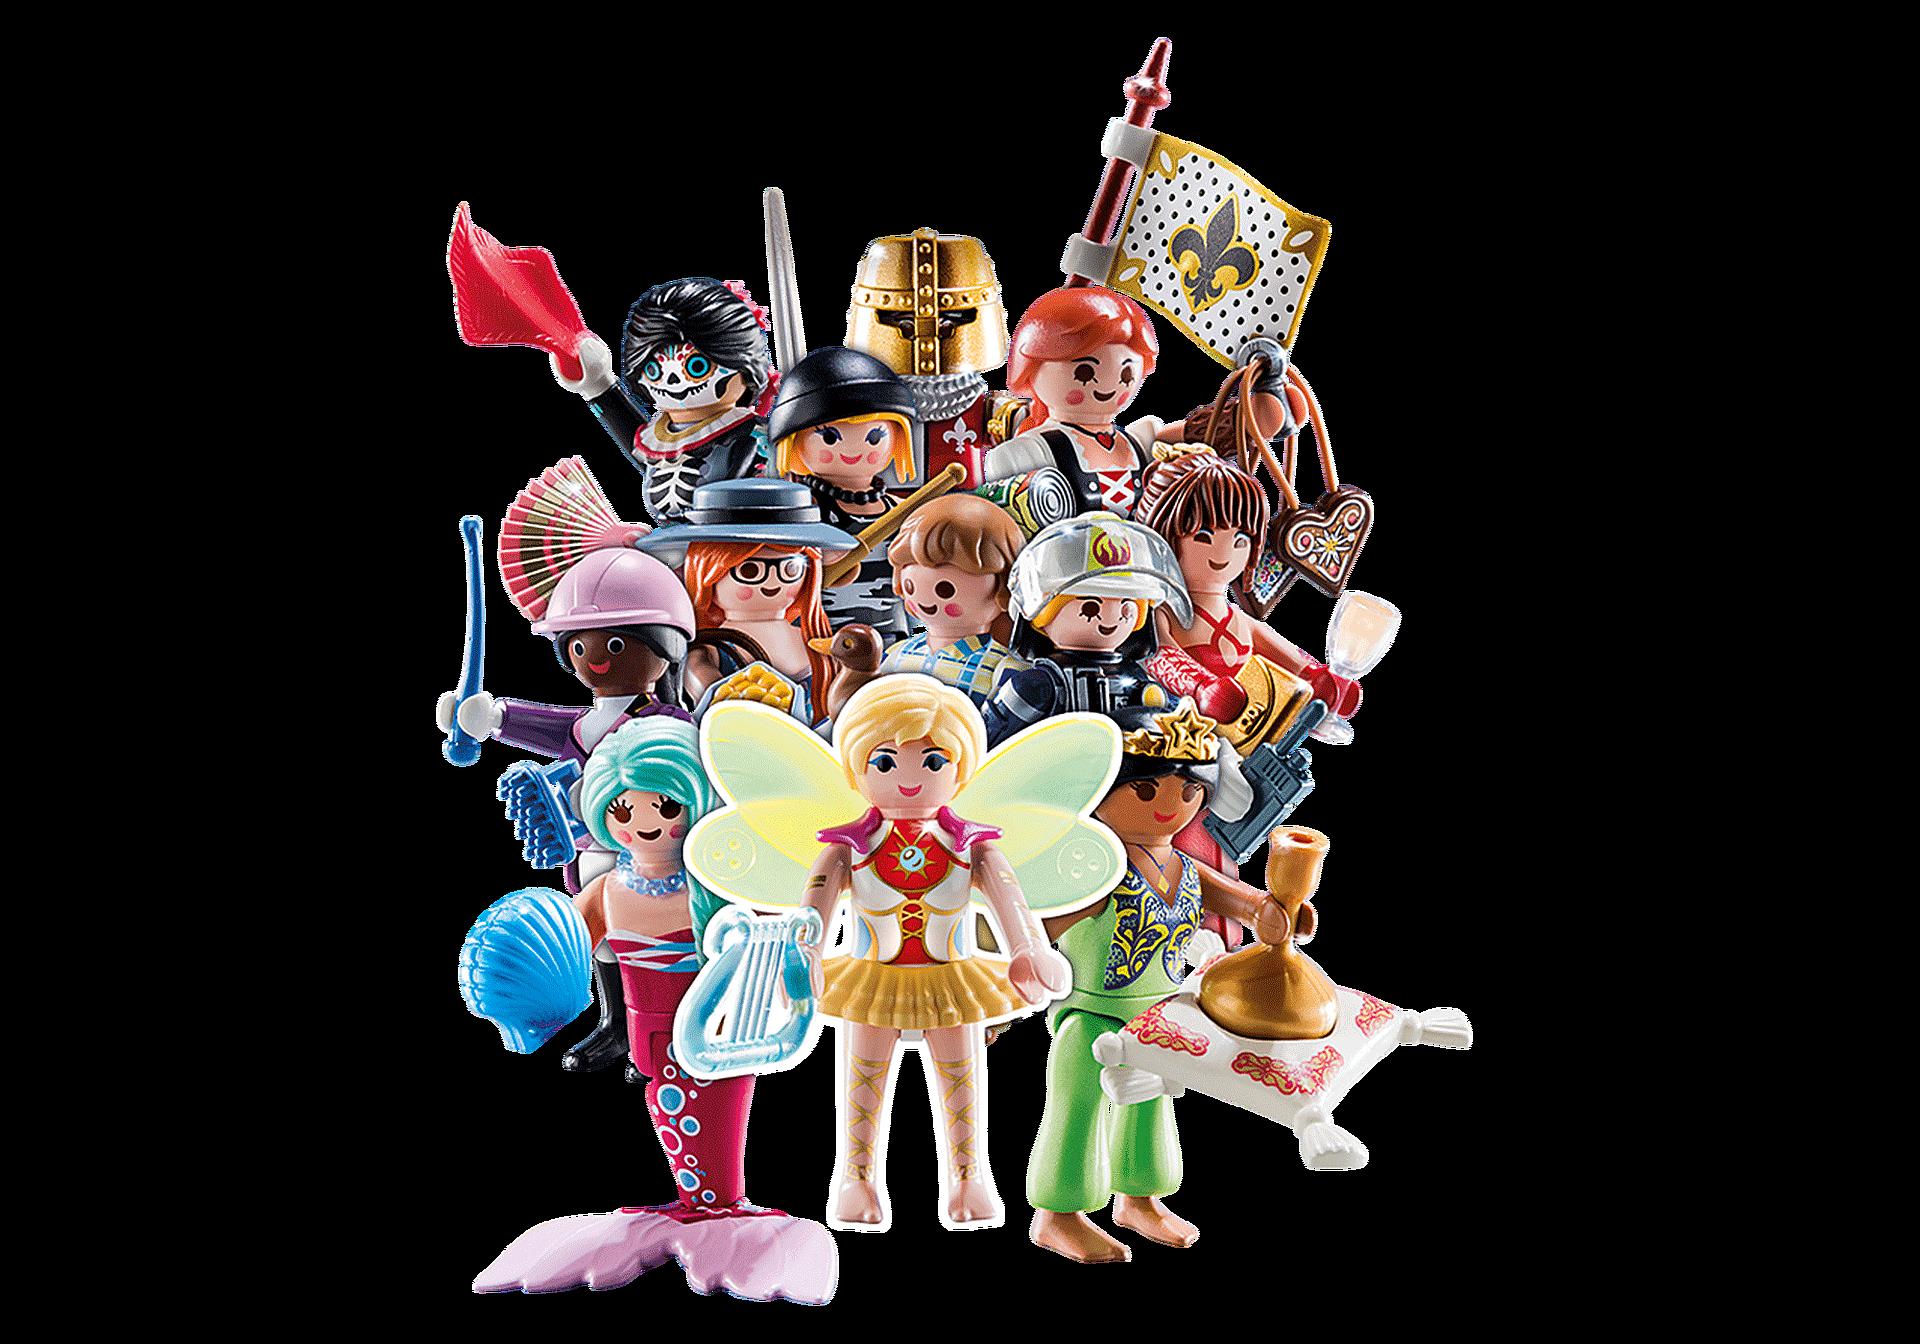 70149 PLAYMOBIL Figures Series 20 - Girls zoom image1